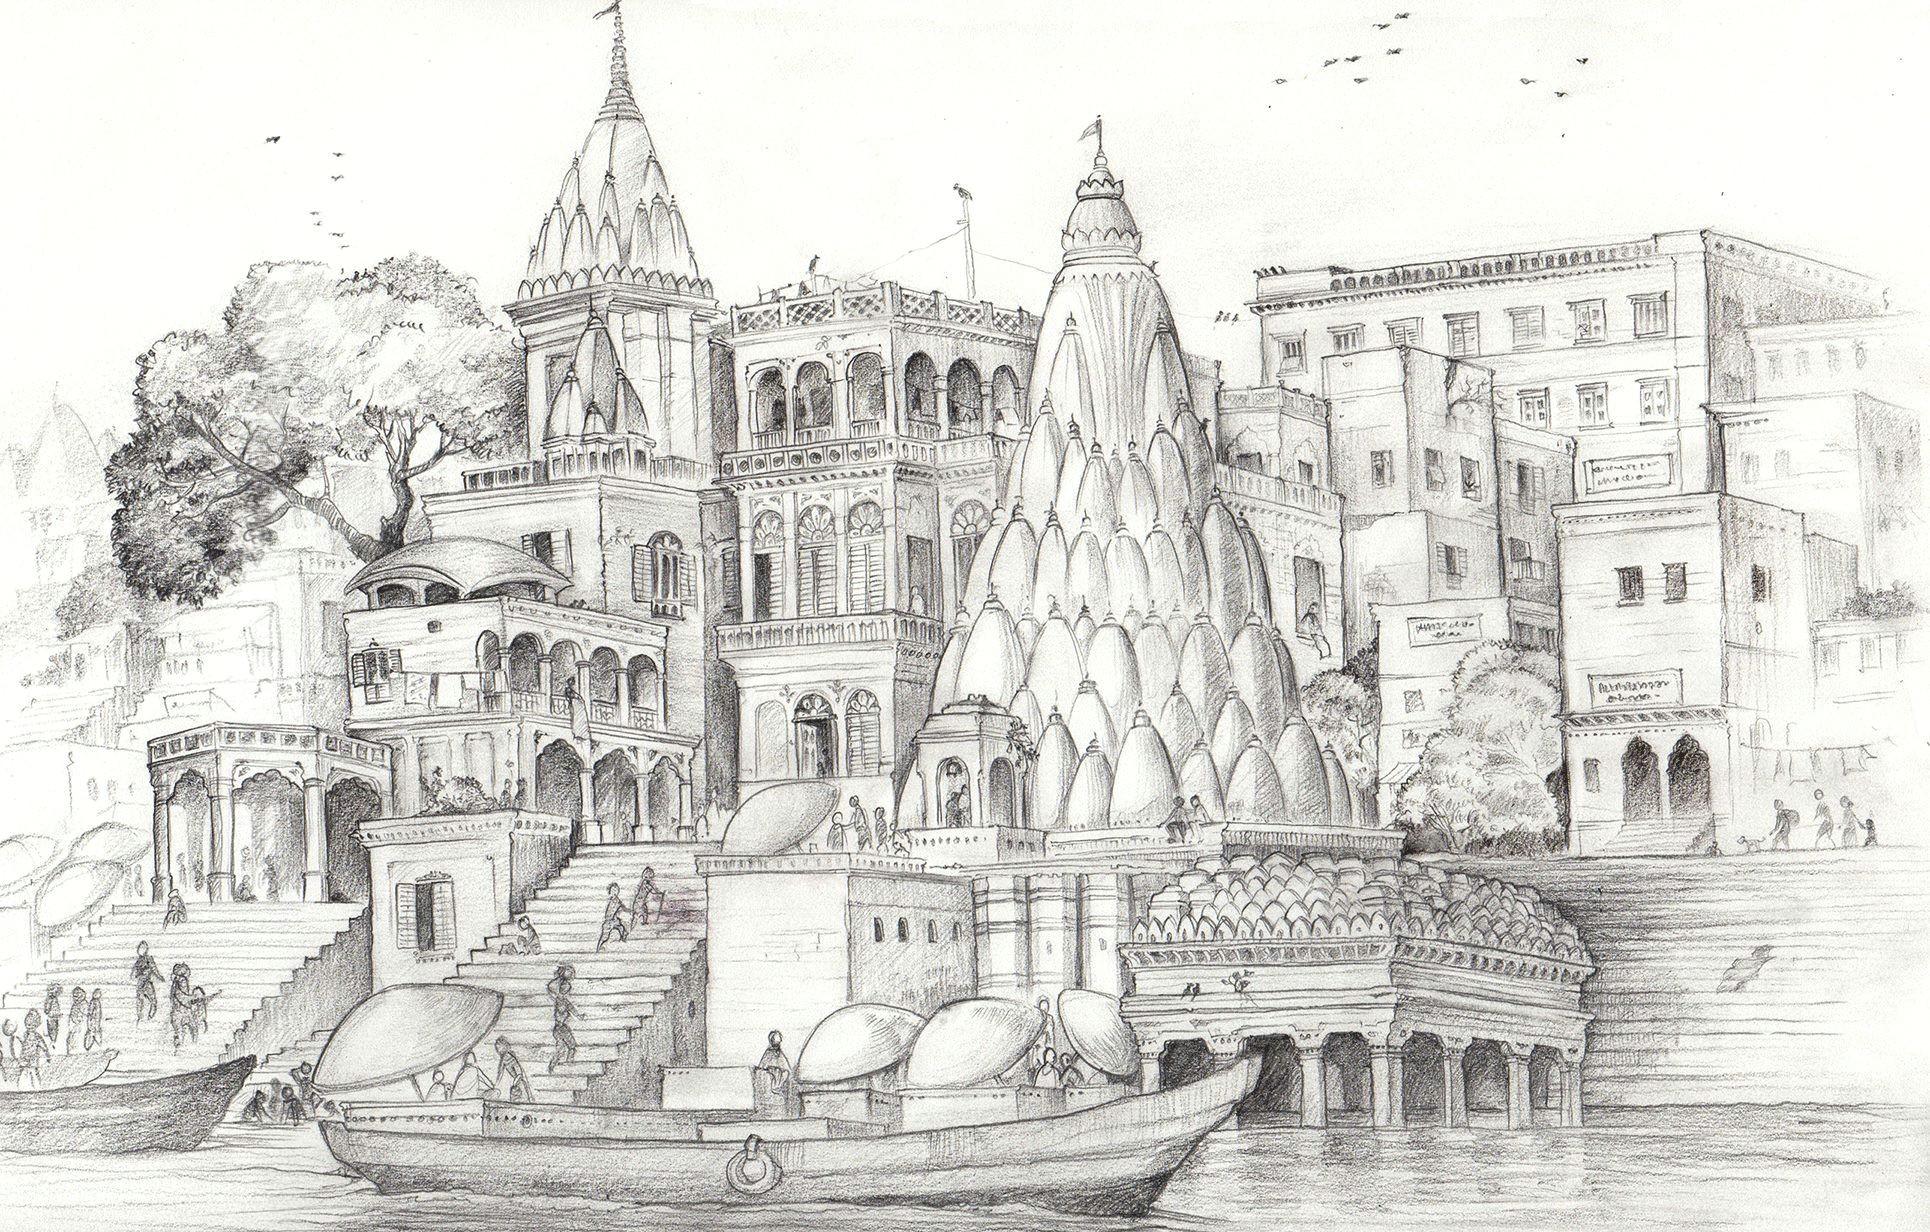 Bank Drawing Easy Varanasi Ghaats Banks Of the Ganges A Pencil Sketch